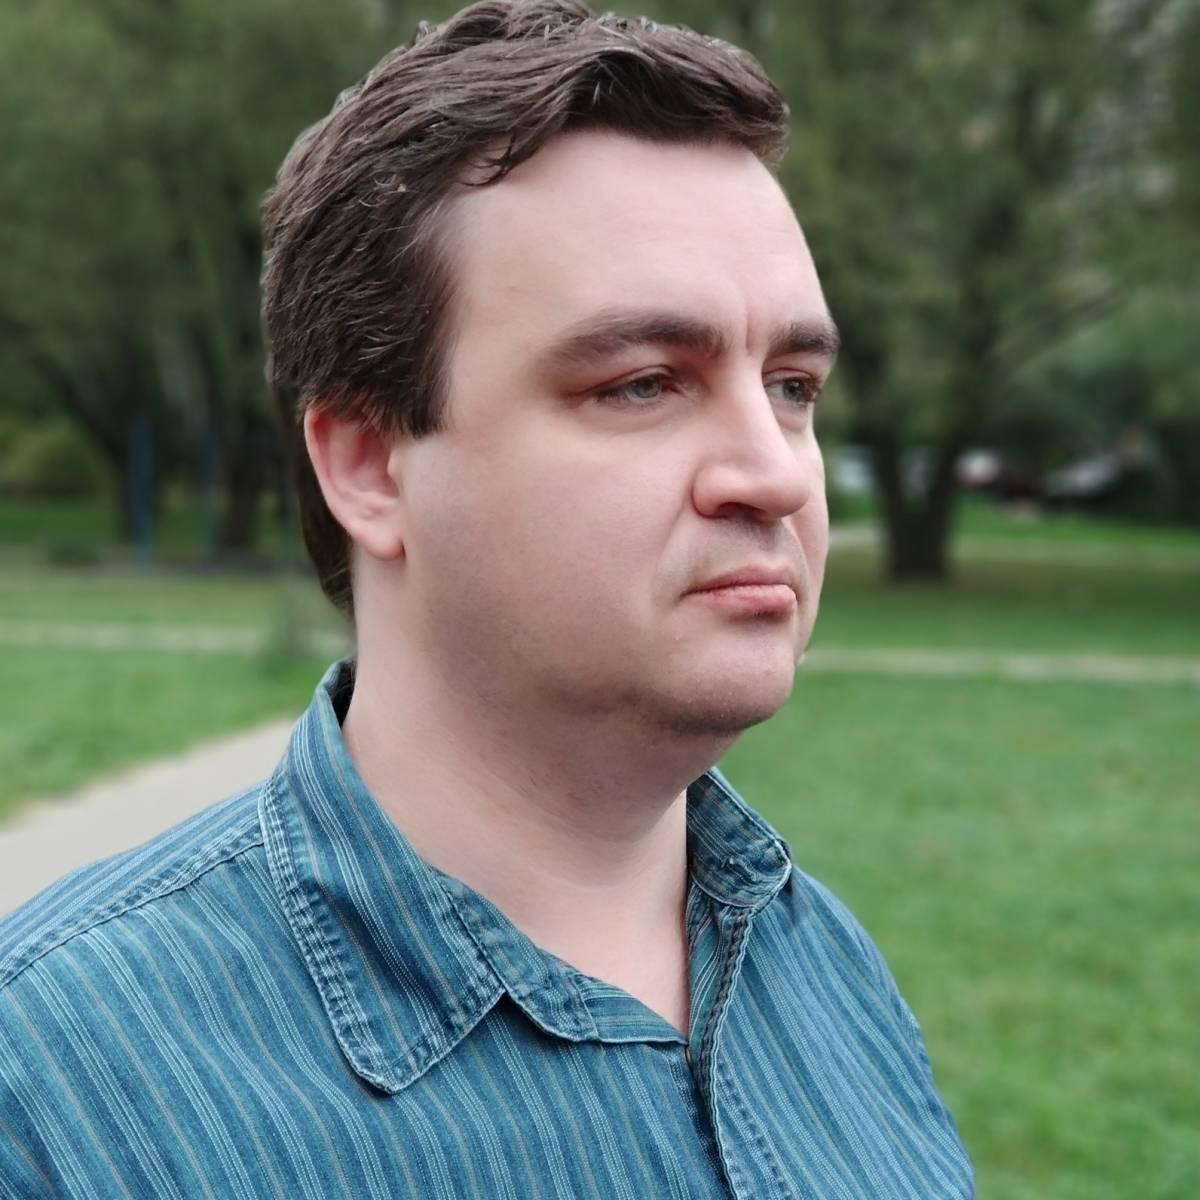 Александр Роджерс: О кривой …